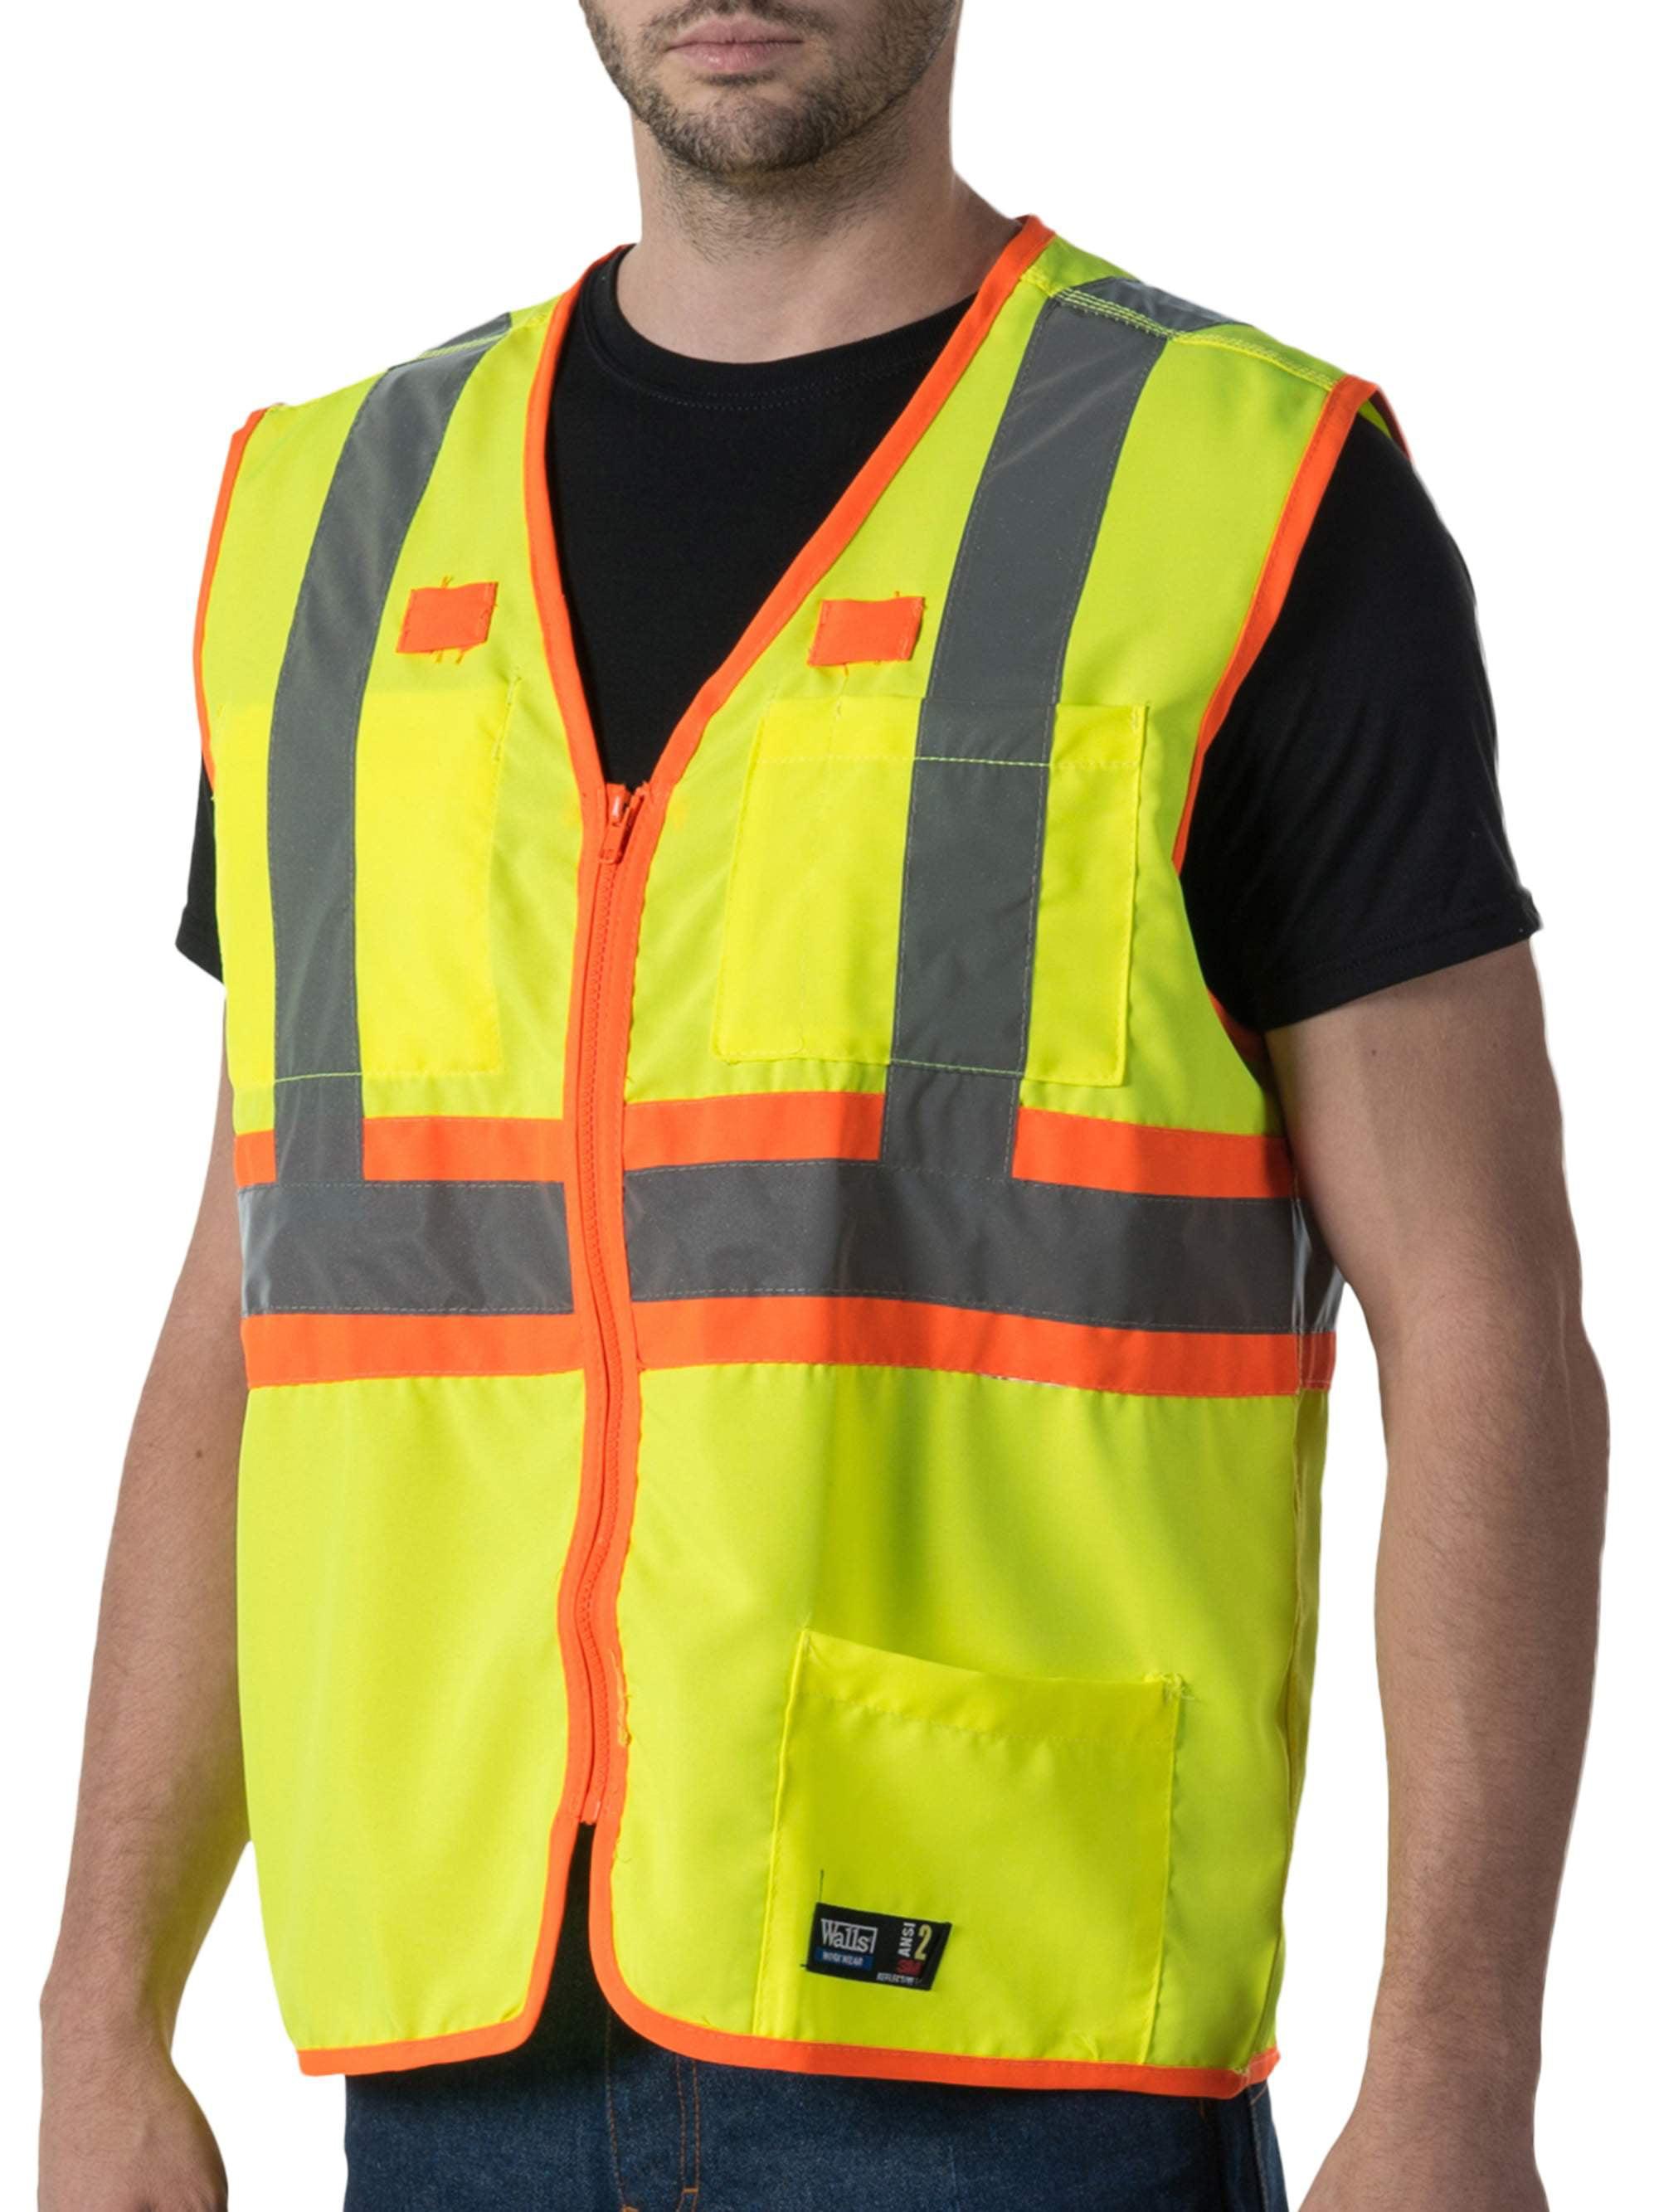 Men's Premium ANSI 2 High Visibility Safety Vest